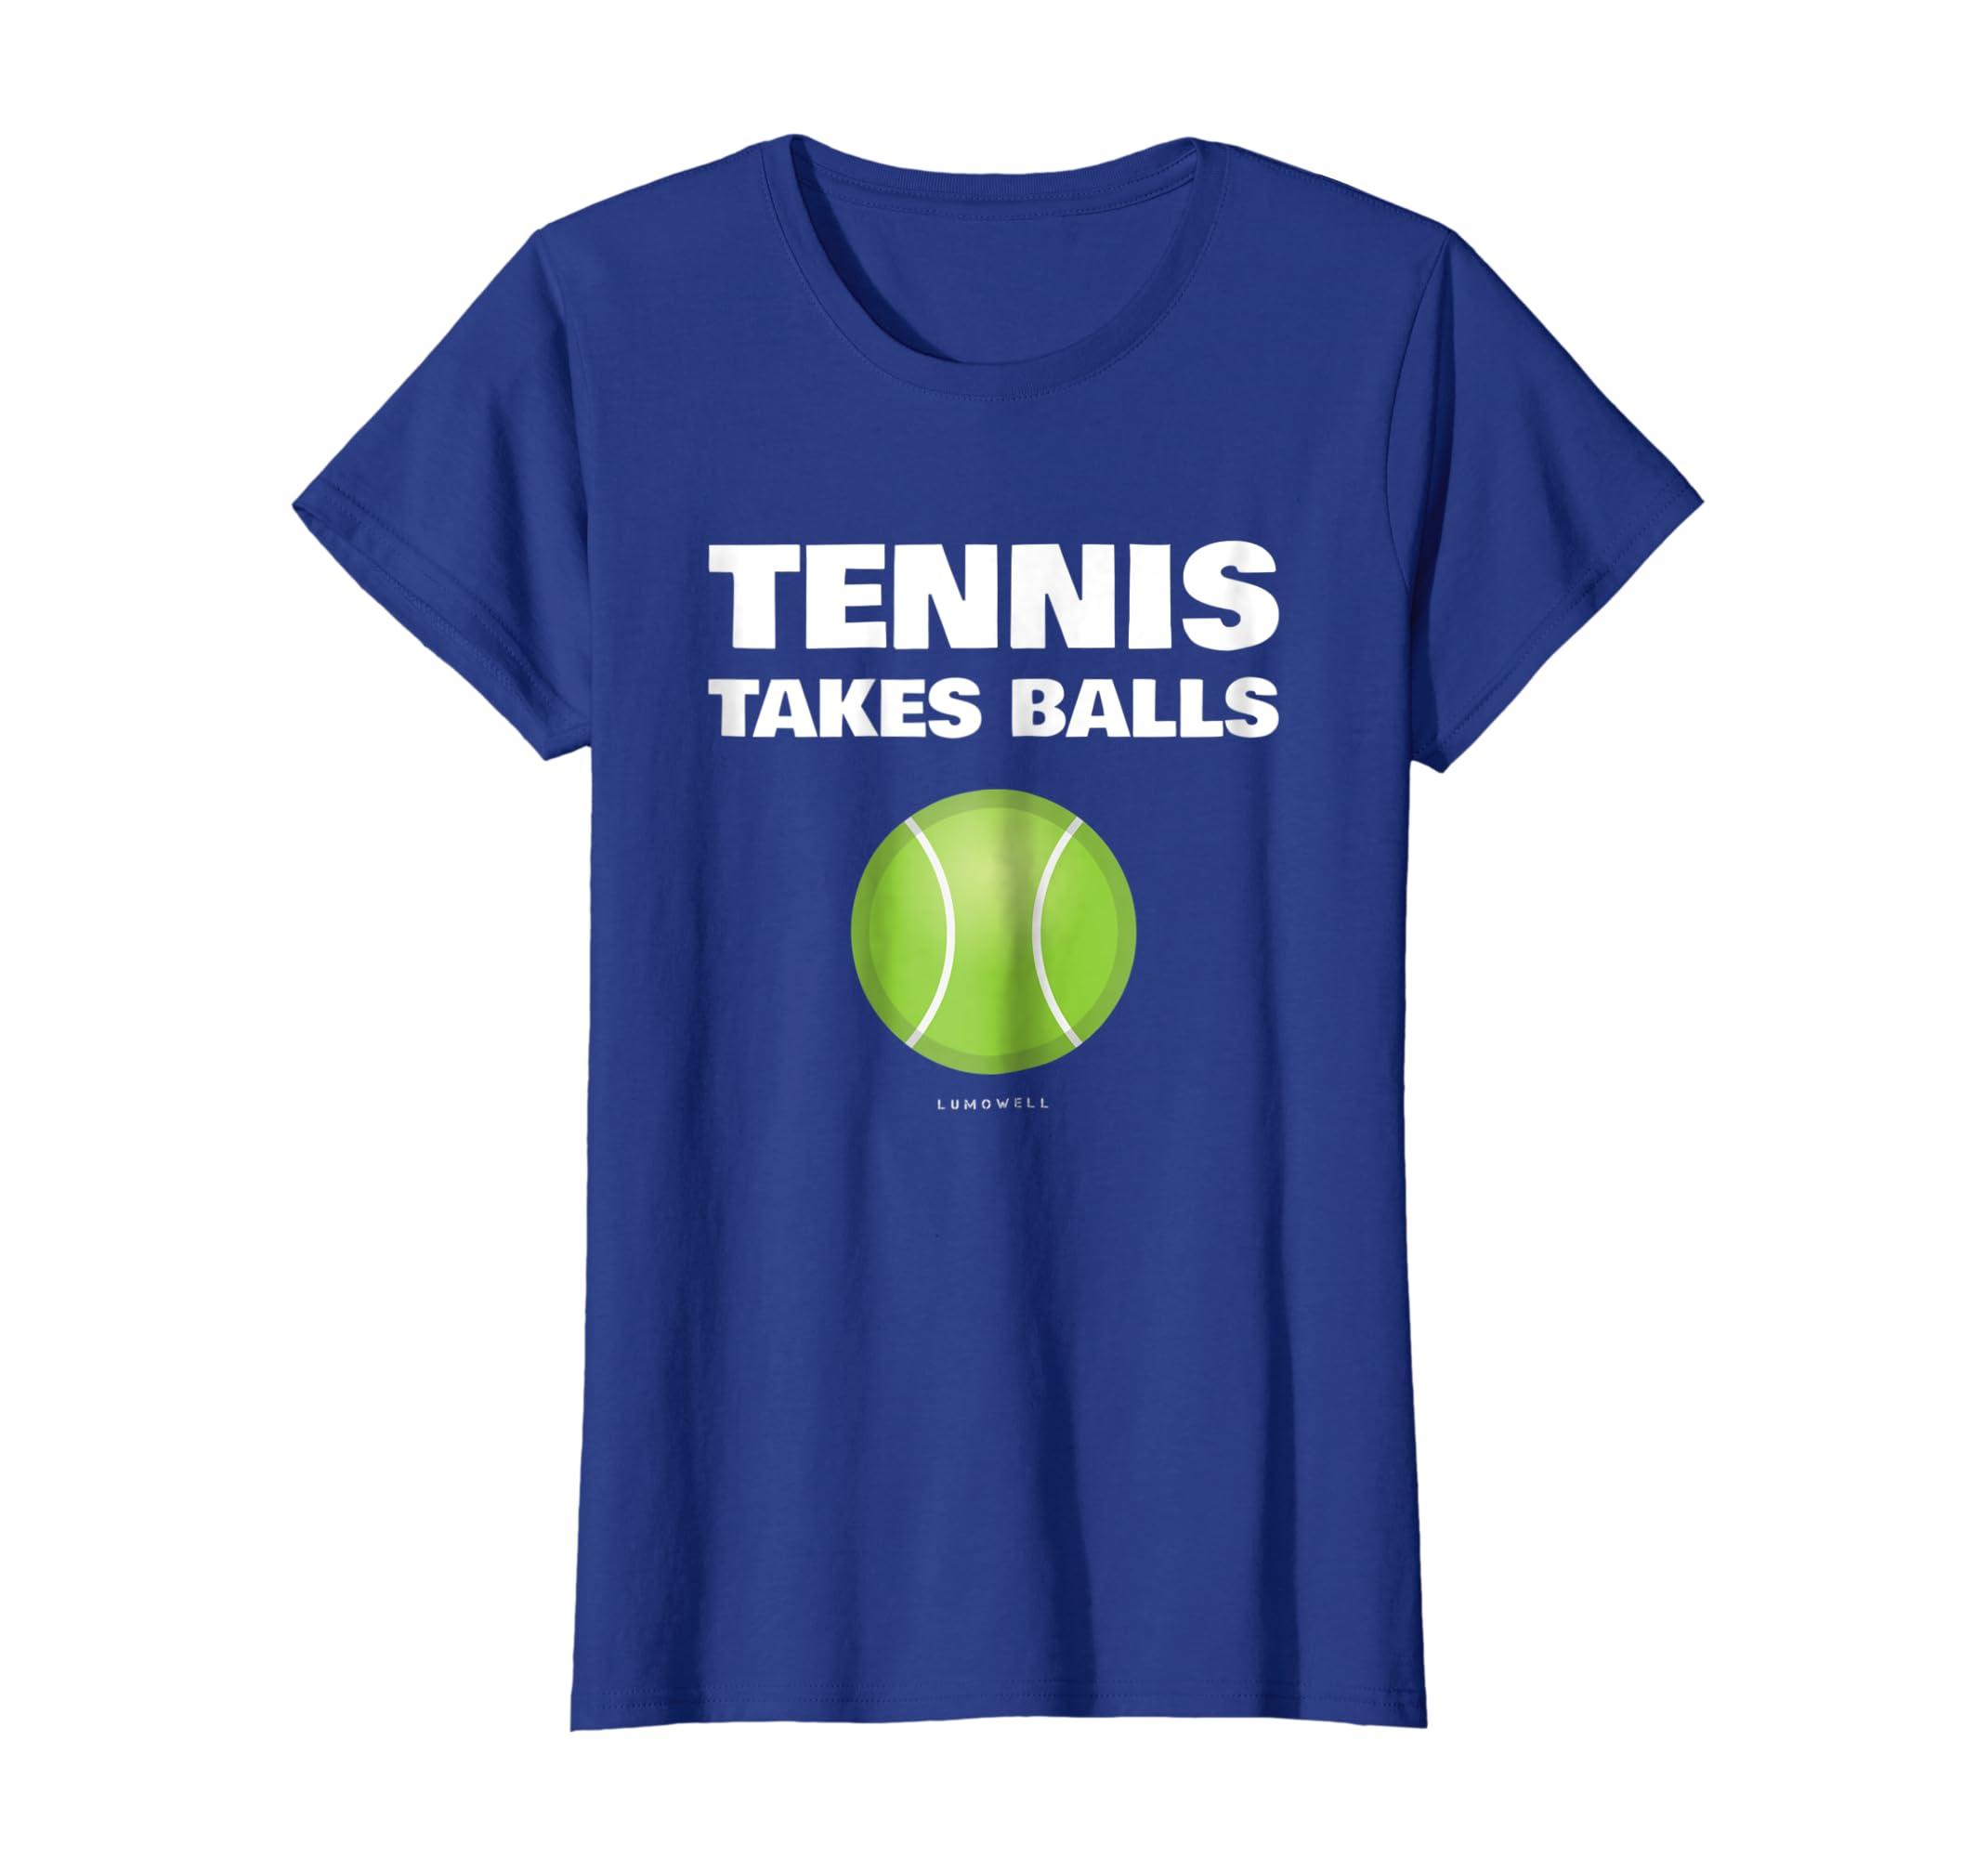 132cbb361 Amazon.com: Funny Tennis T Shirts - Tennis Takes Balls T-Shirt: Clothing